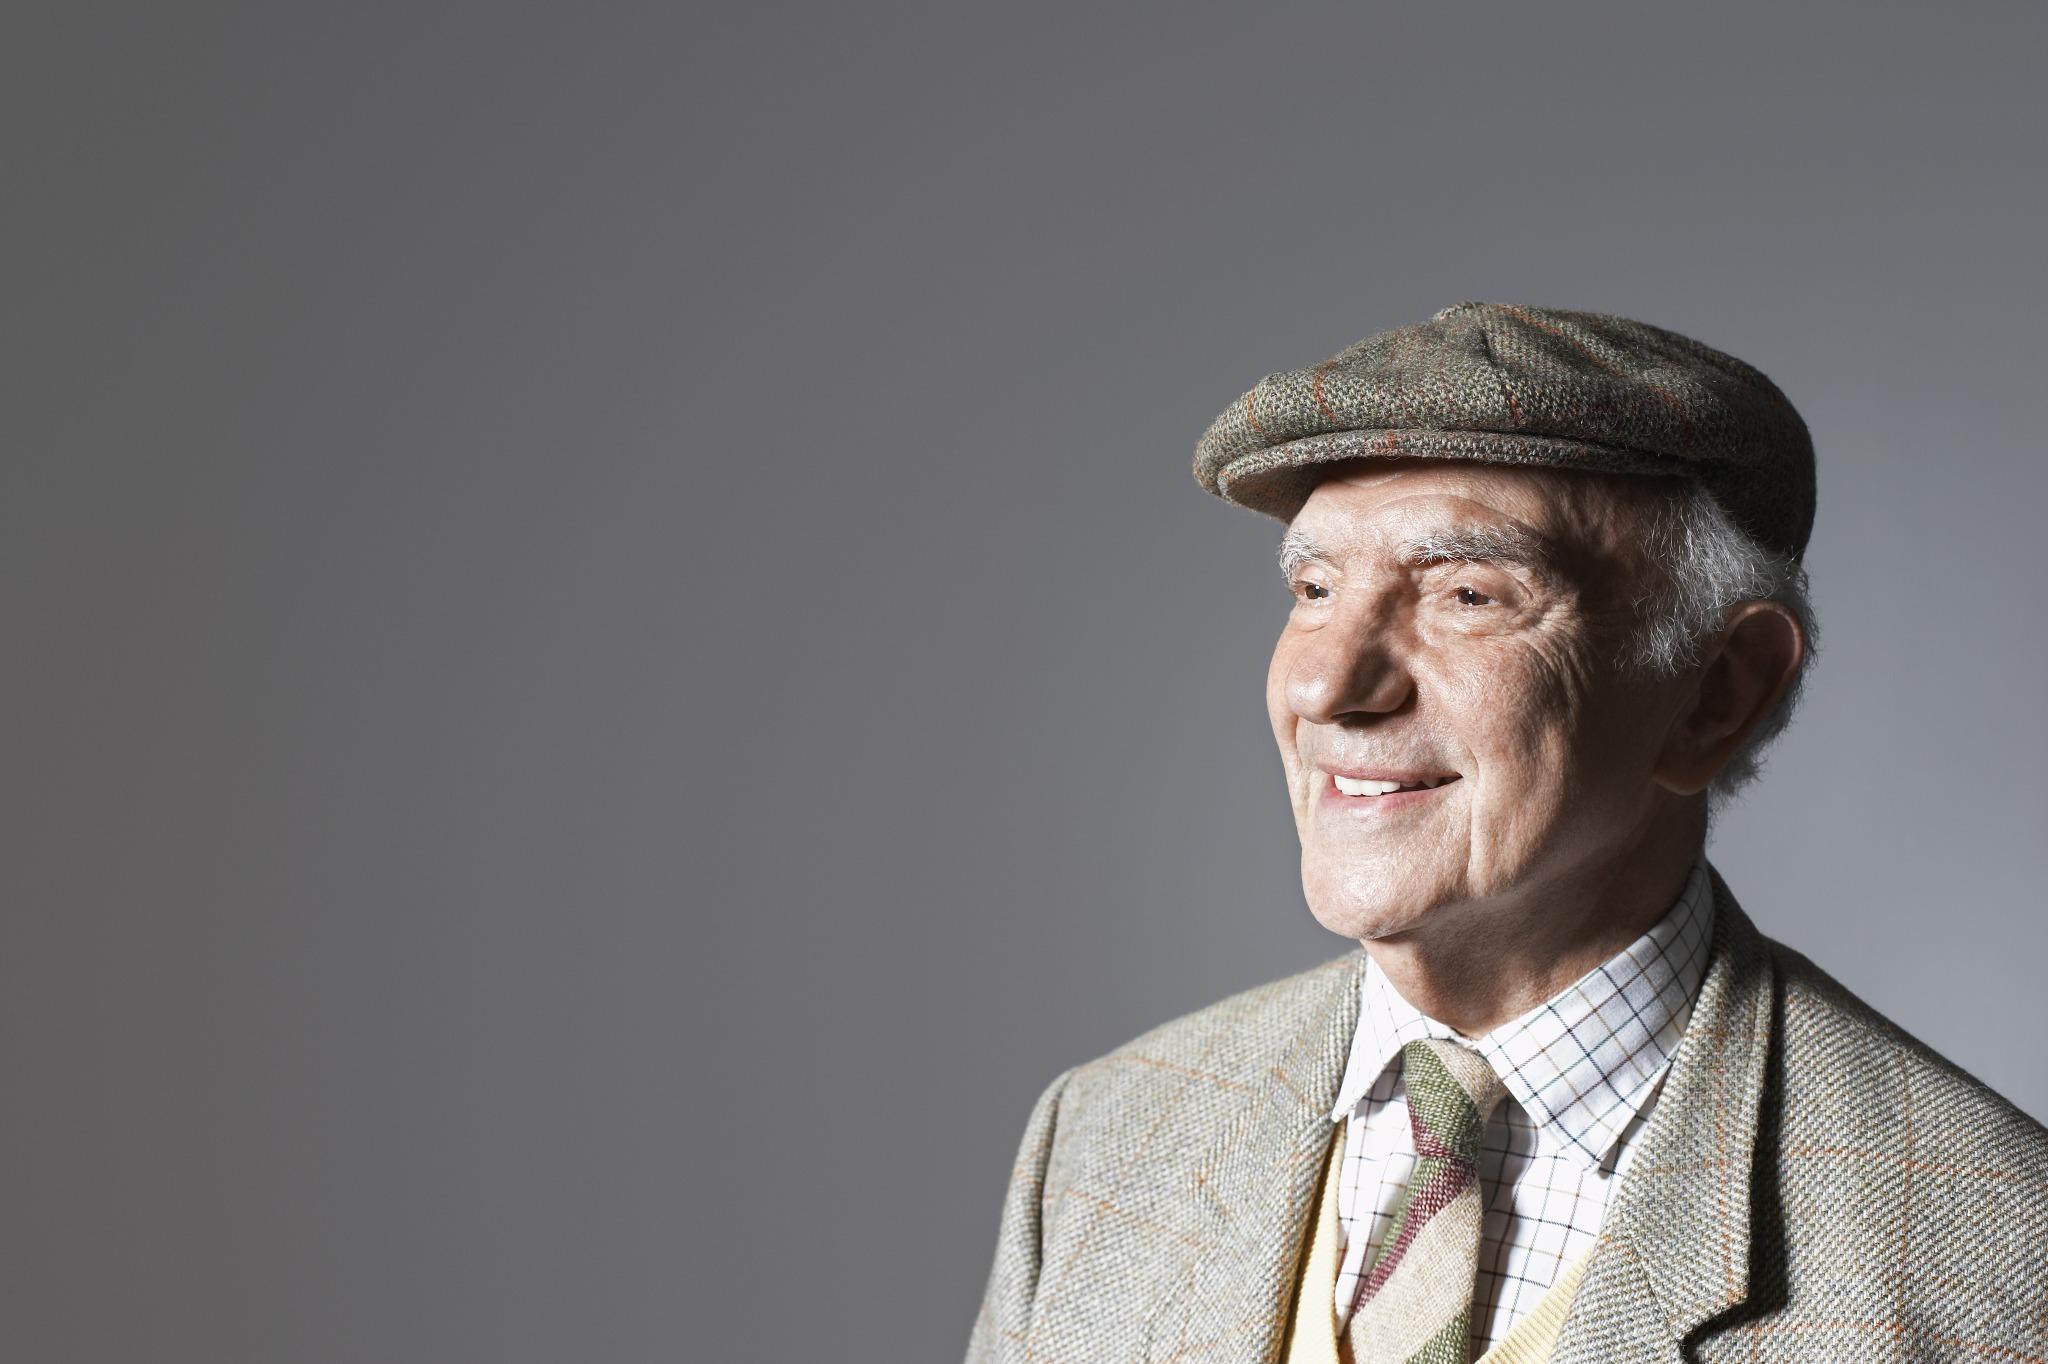 An older gentleman smiling and wearing a flat cap.